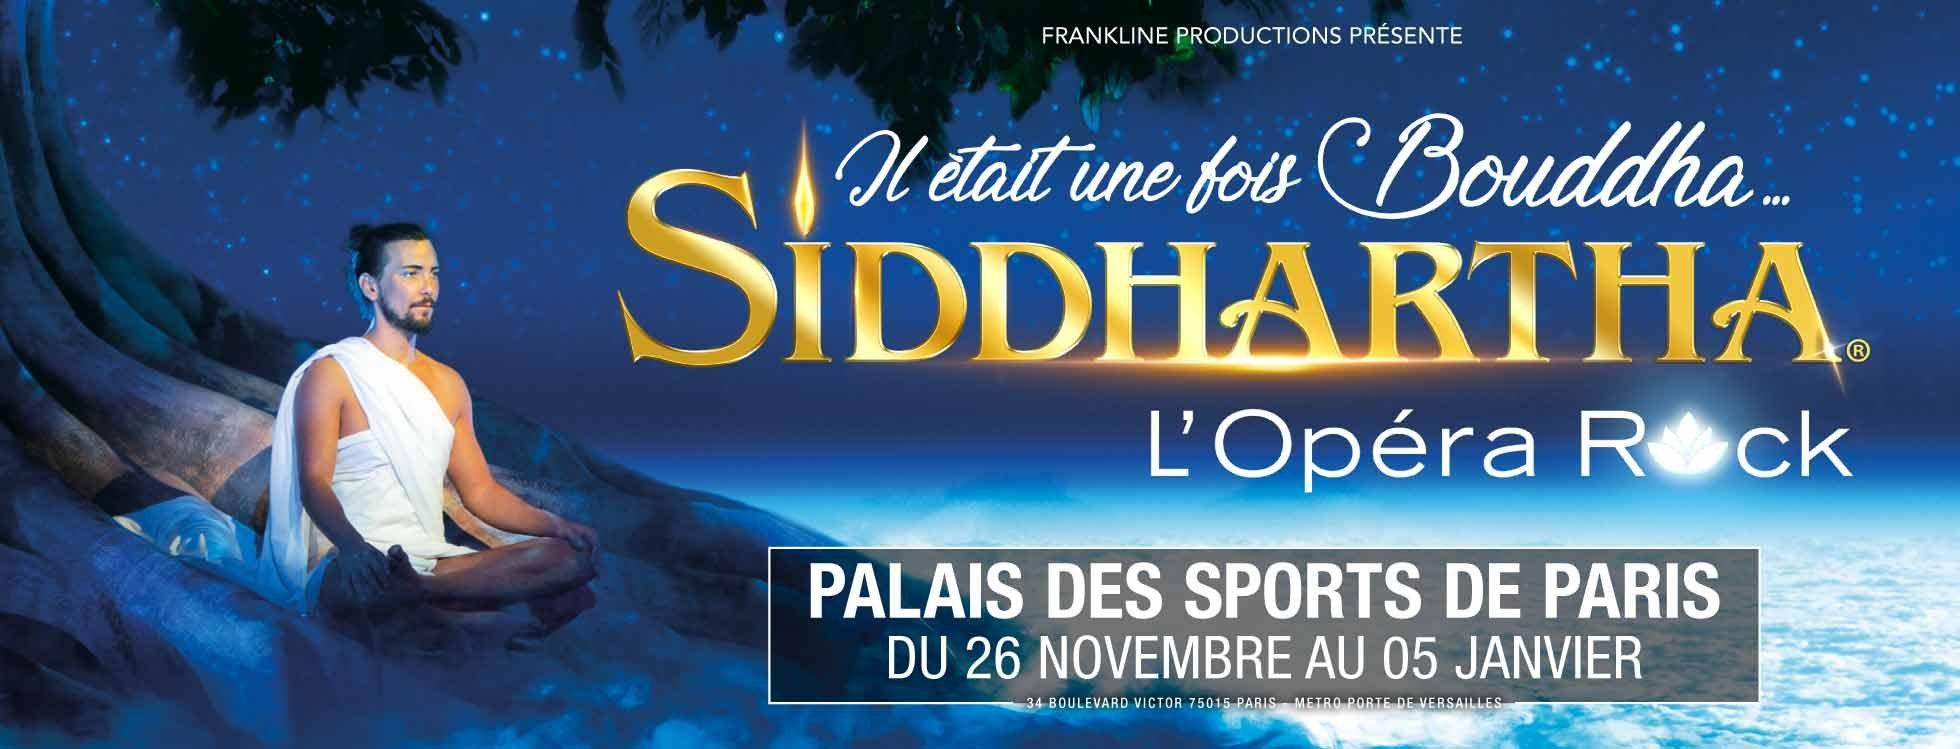 dome de paris : SIDDHARTHA l'Opéra Rock